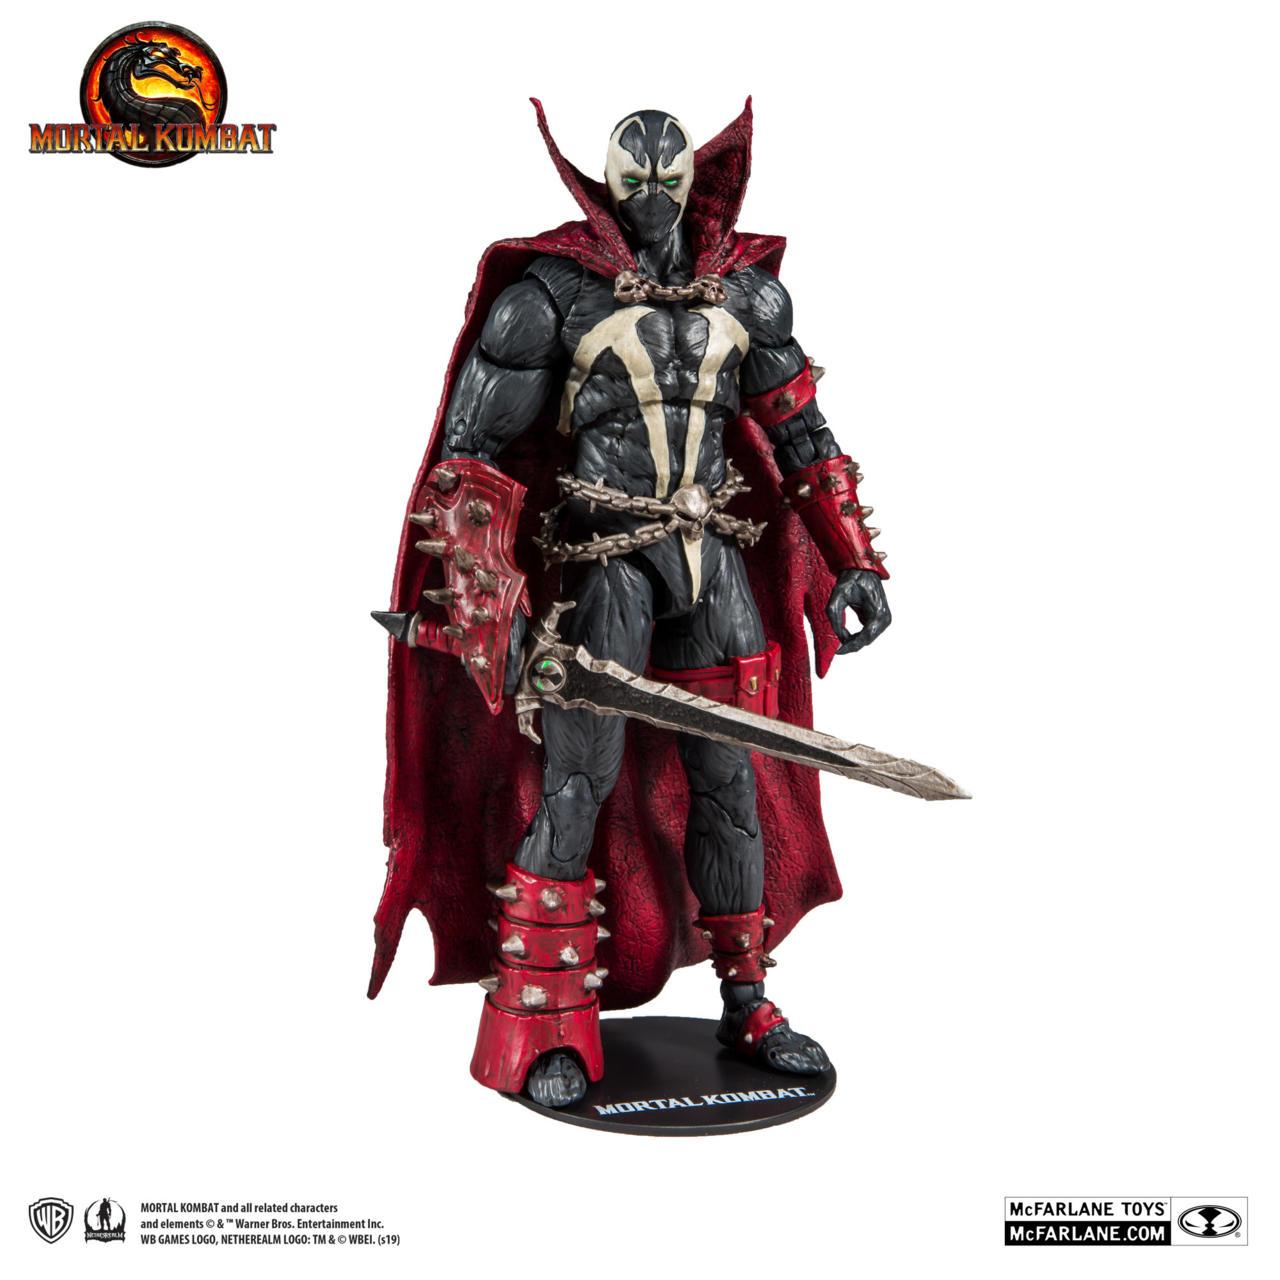 Spawn Mortal Kombat action figure